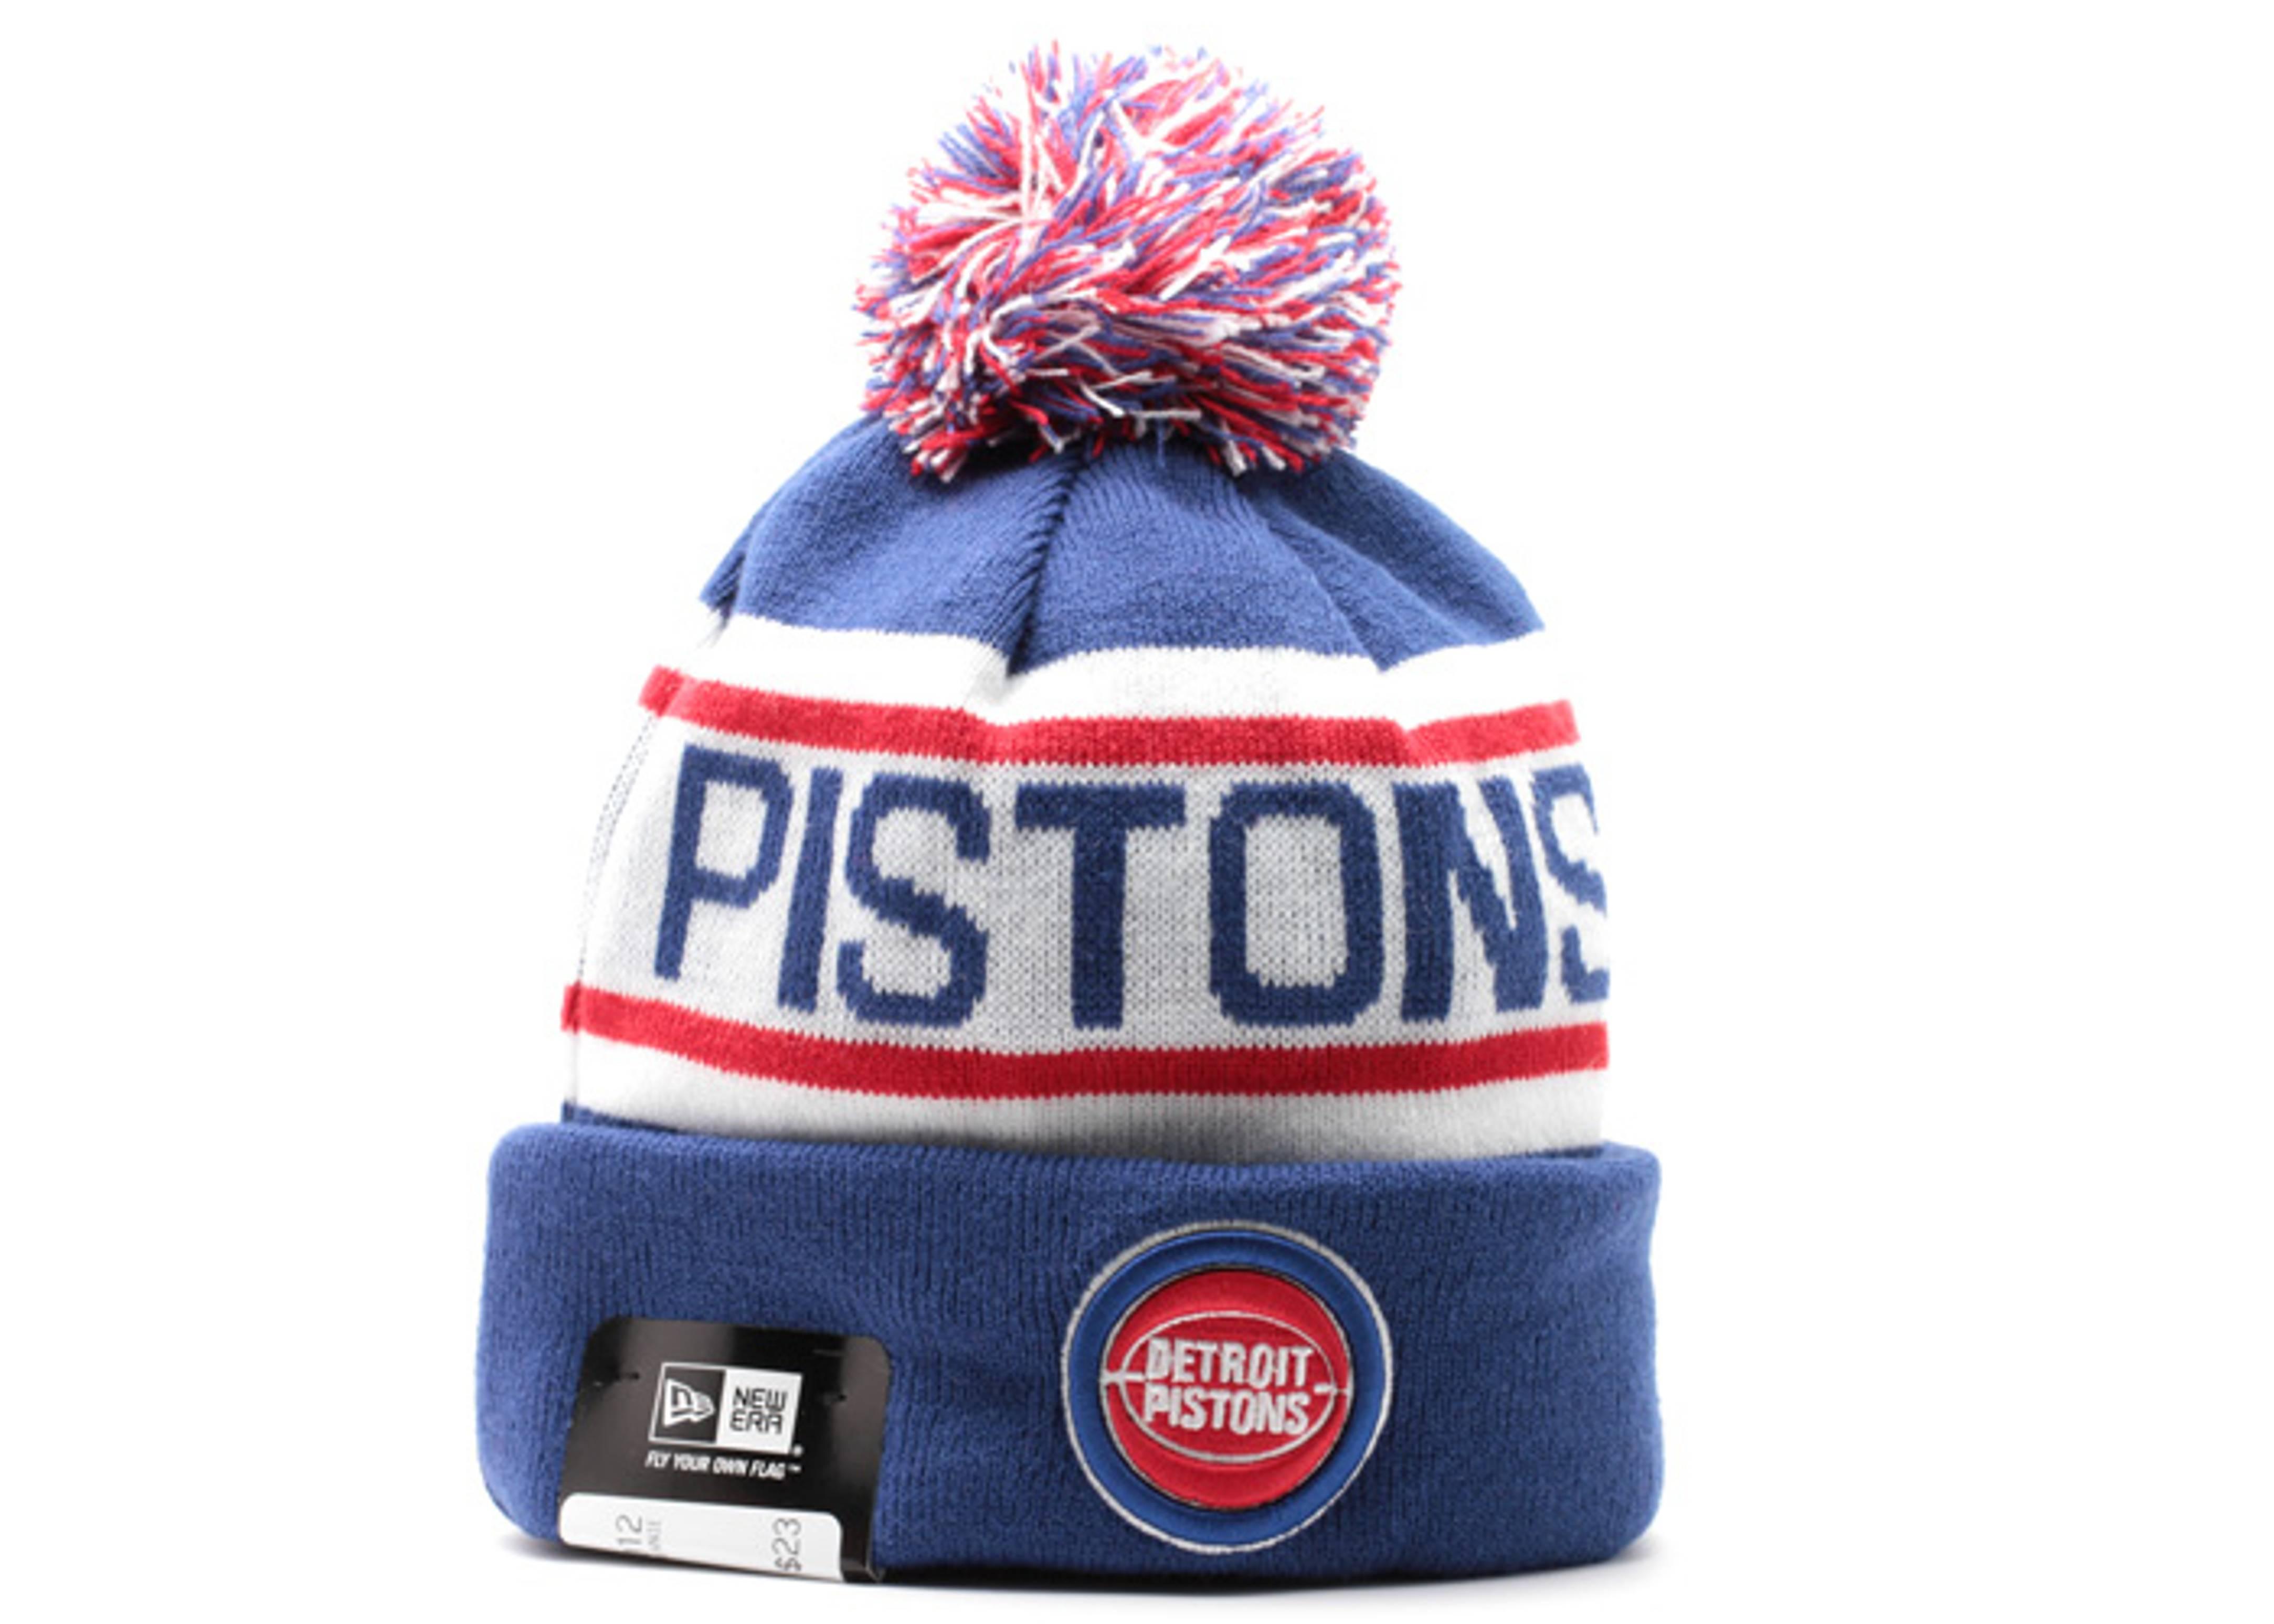 the best attitude 29a62 35424 ... discount code for detroit pistons cuffed pom knit beanie 224d3 da431